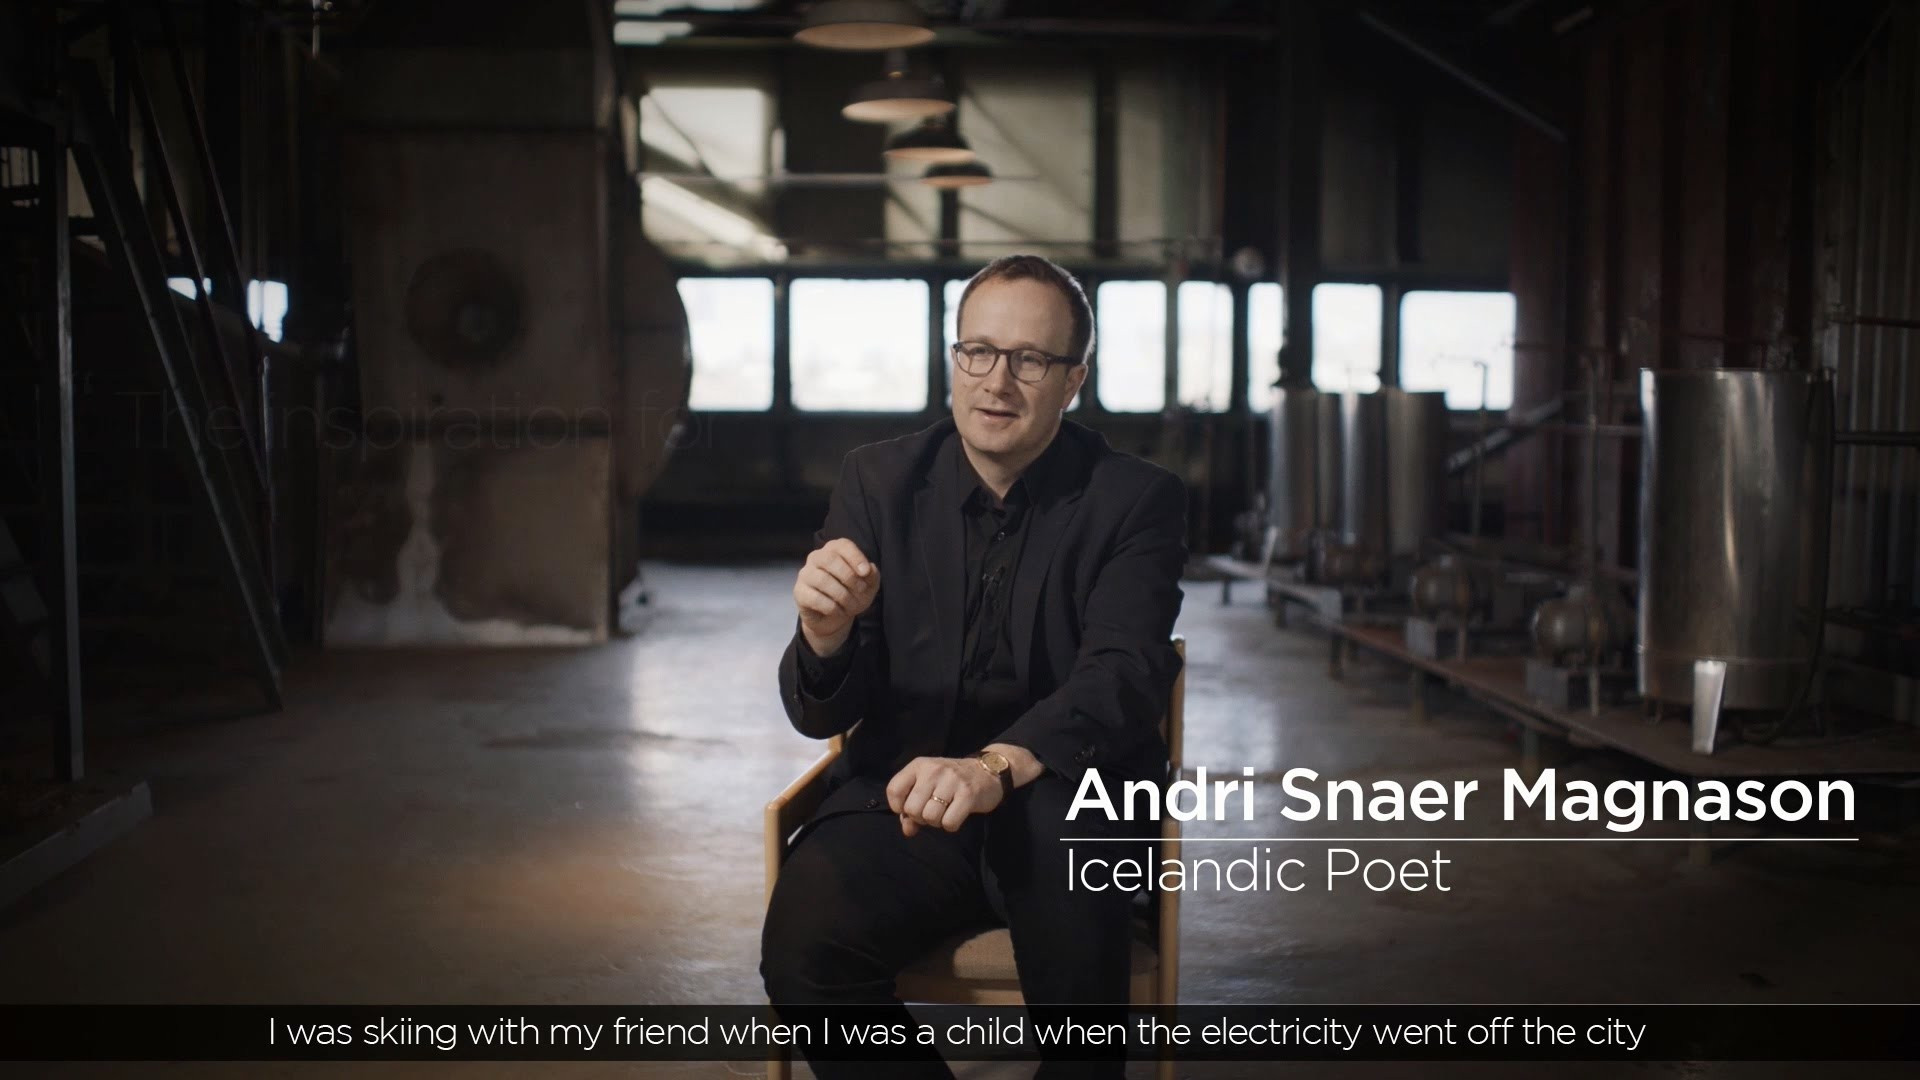 2016 LG OLED TV Iceland Aurora: Andri Snaer Magnason